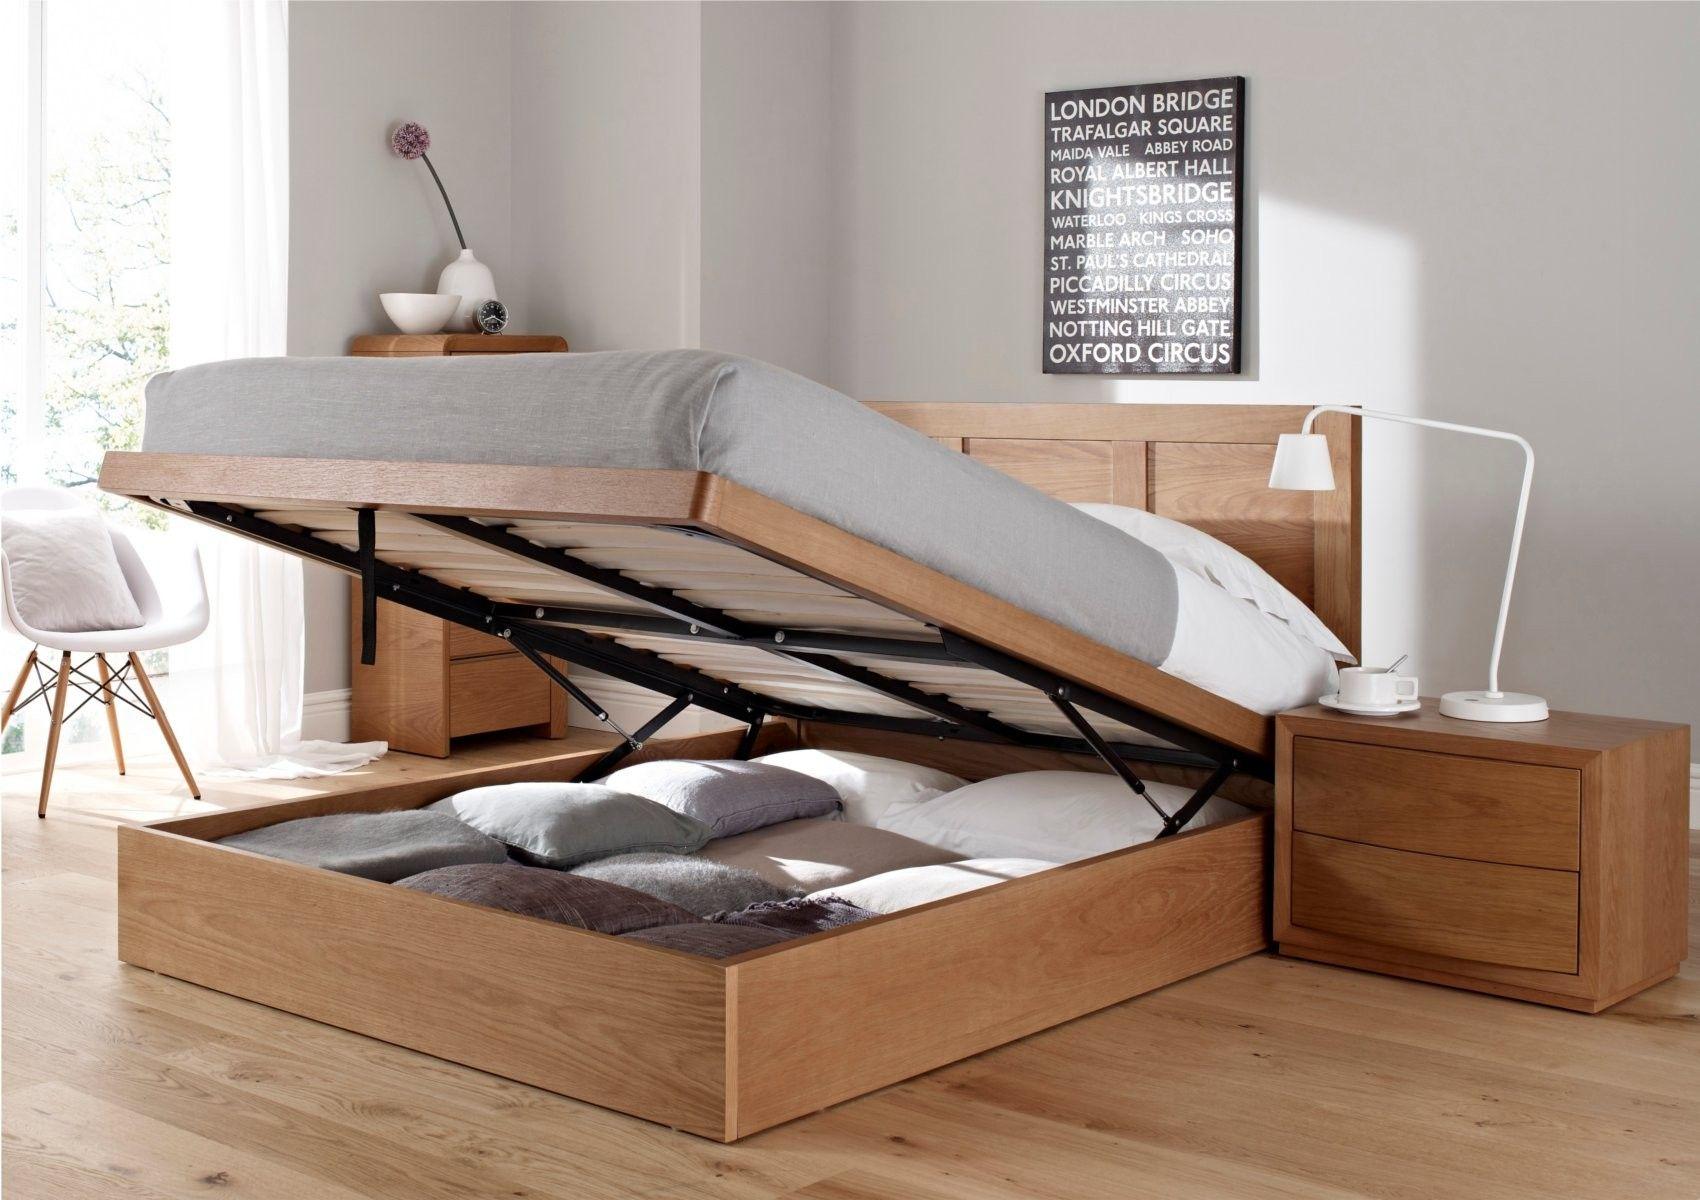 Oakland Ottoman Storage Bed Bed Headboard Design